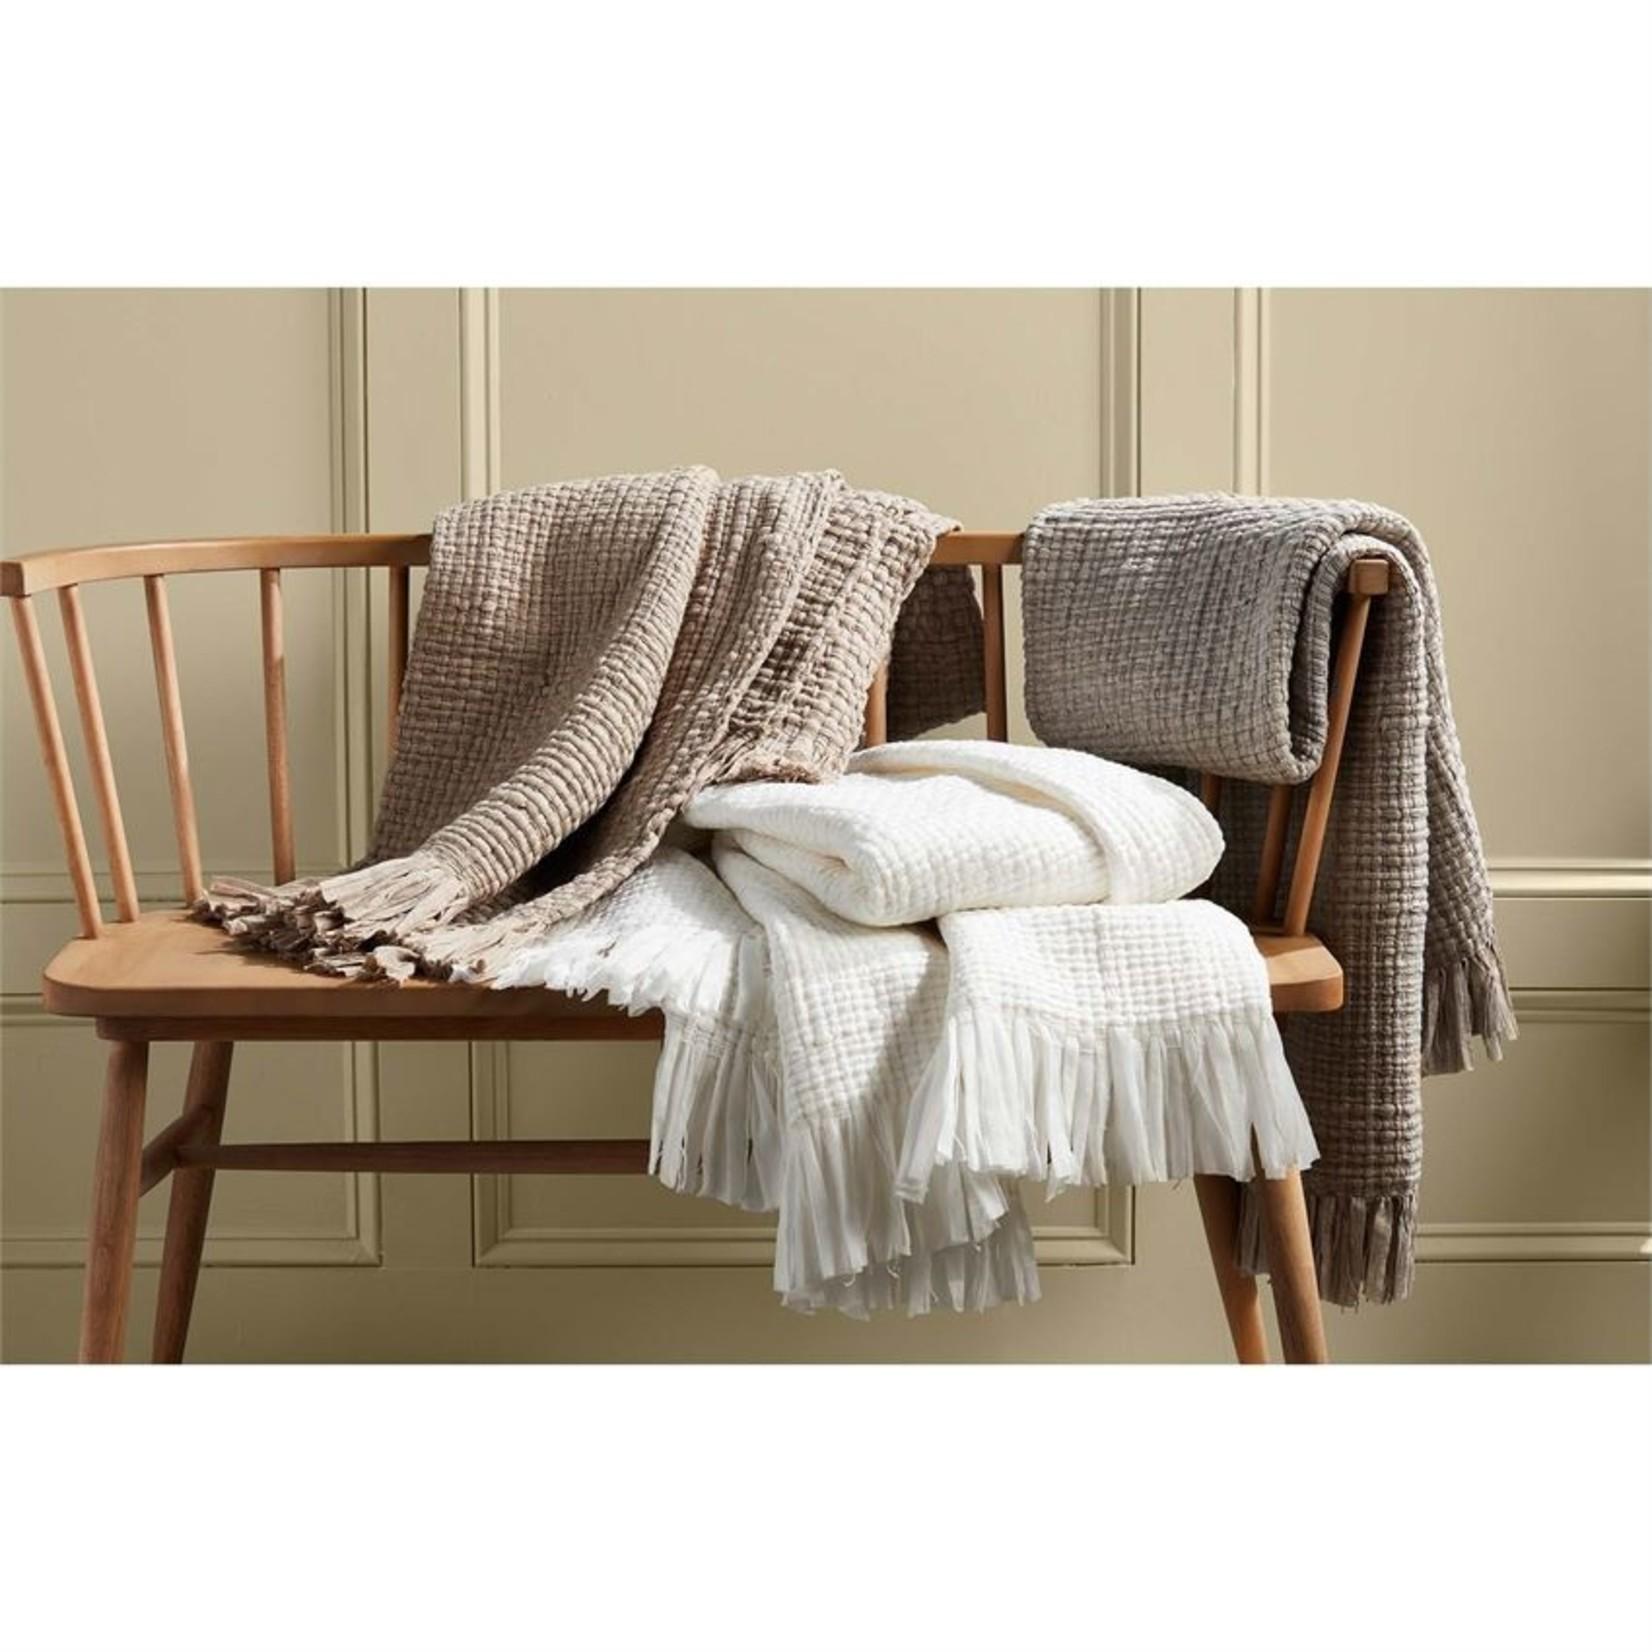 Fringe Blankets